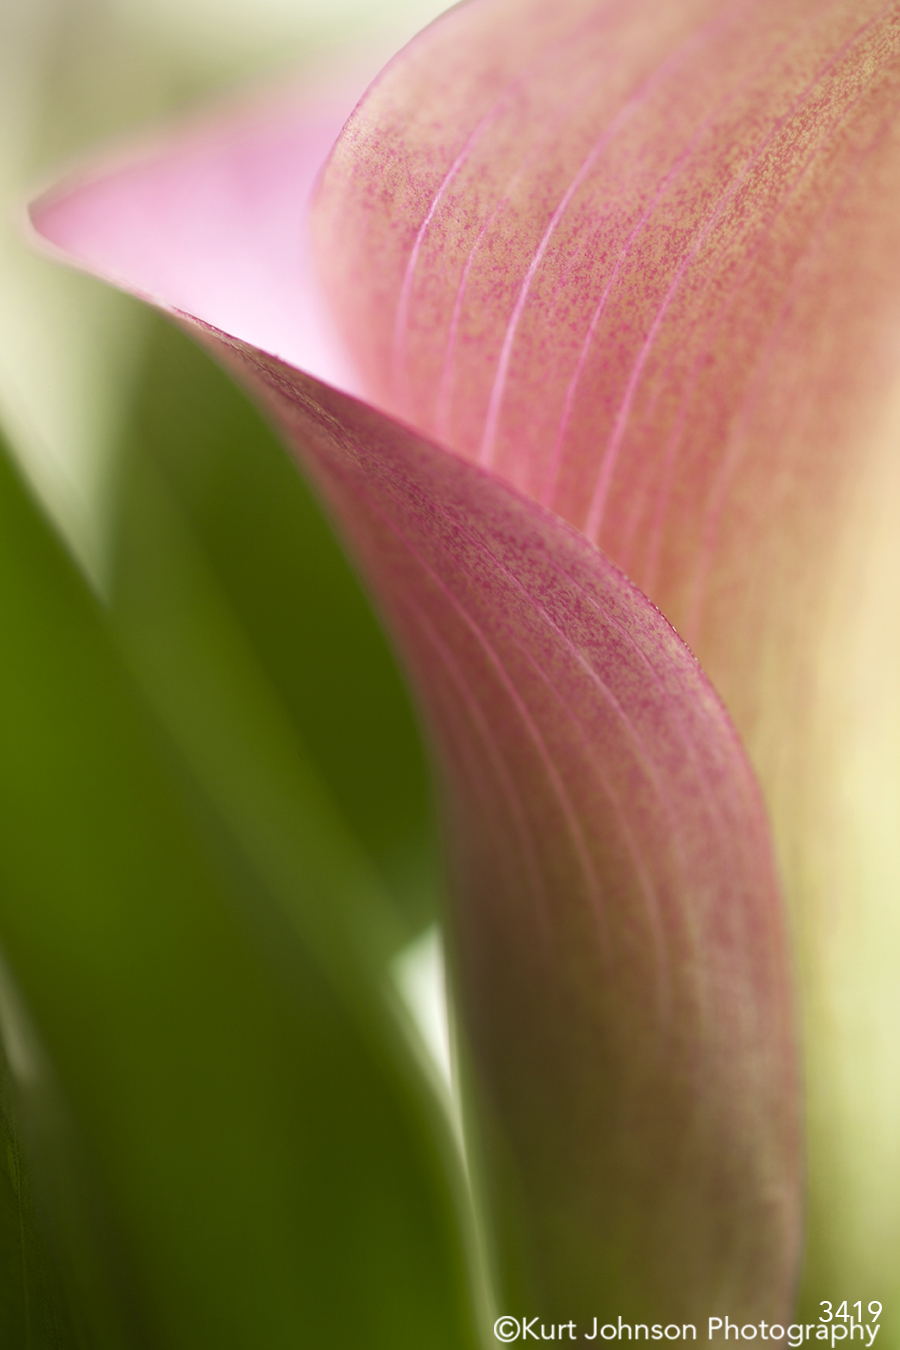 flower petal curve pink green bloom detail close up